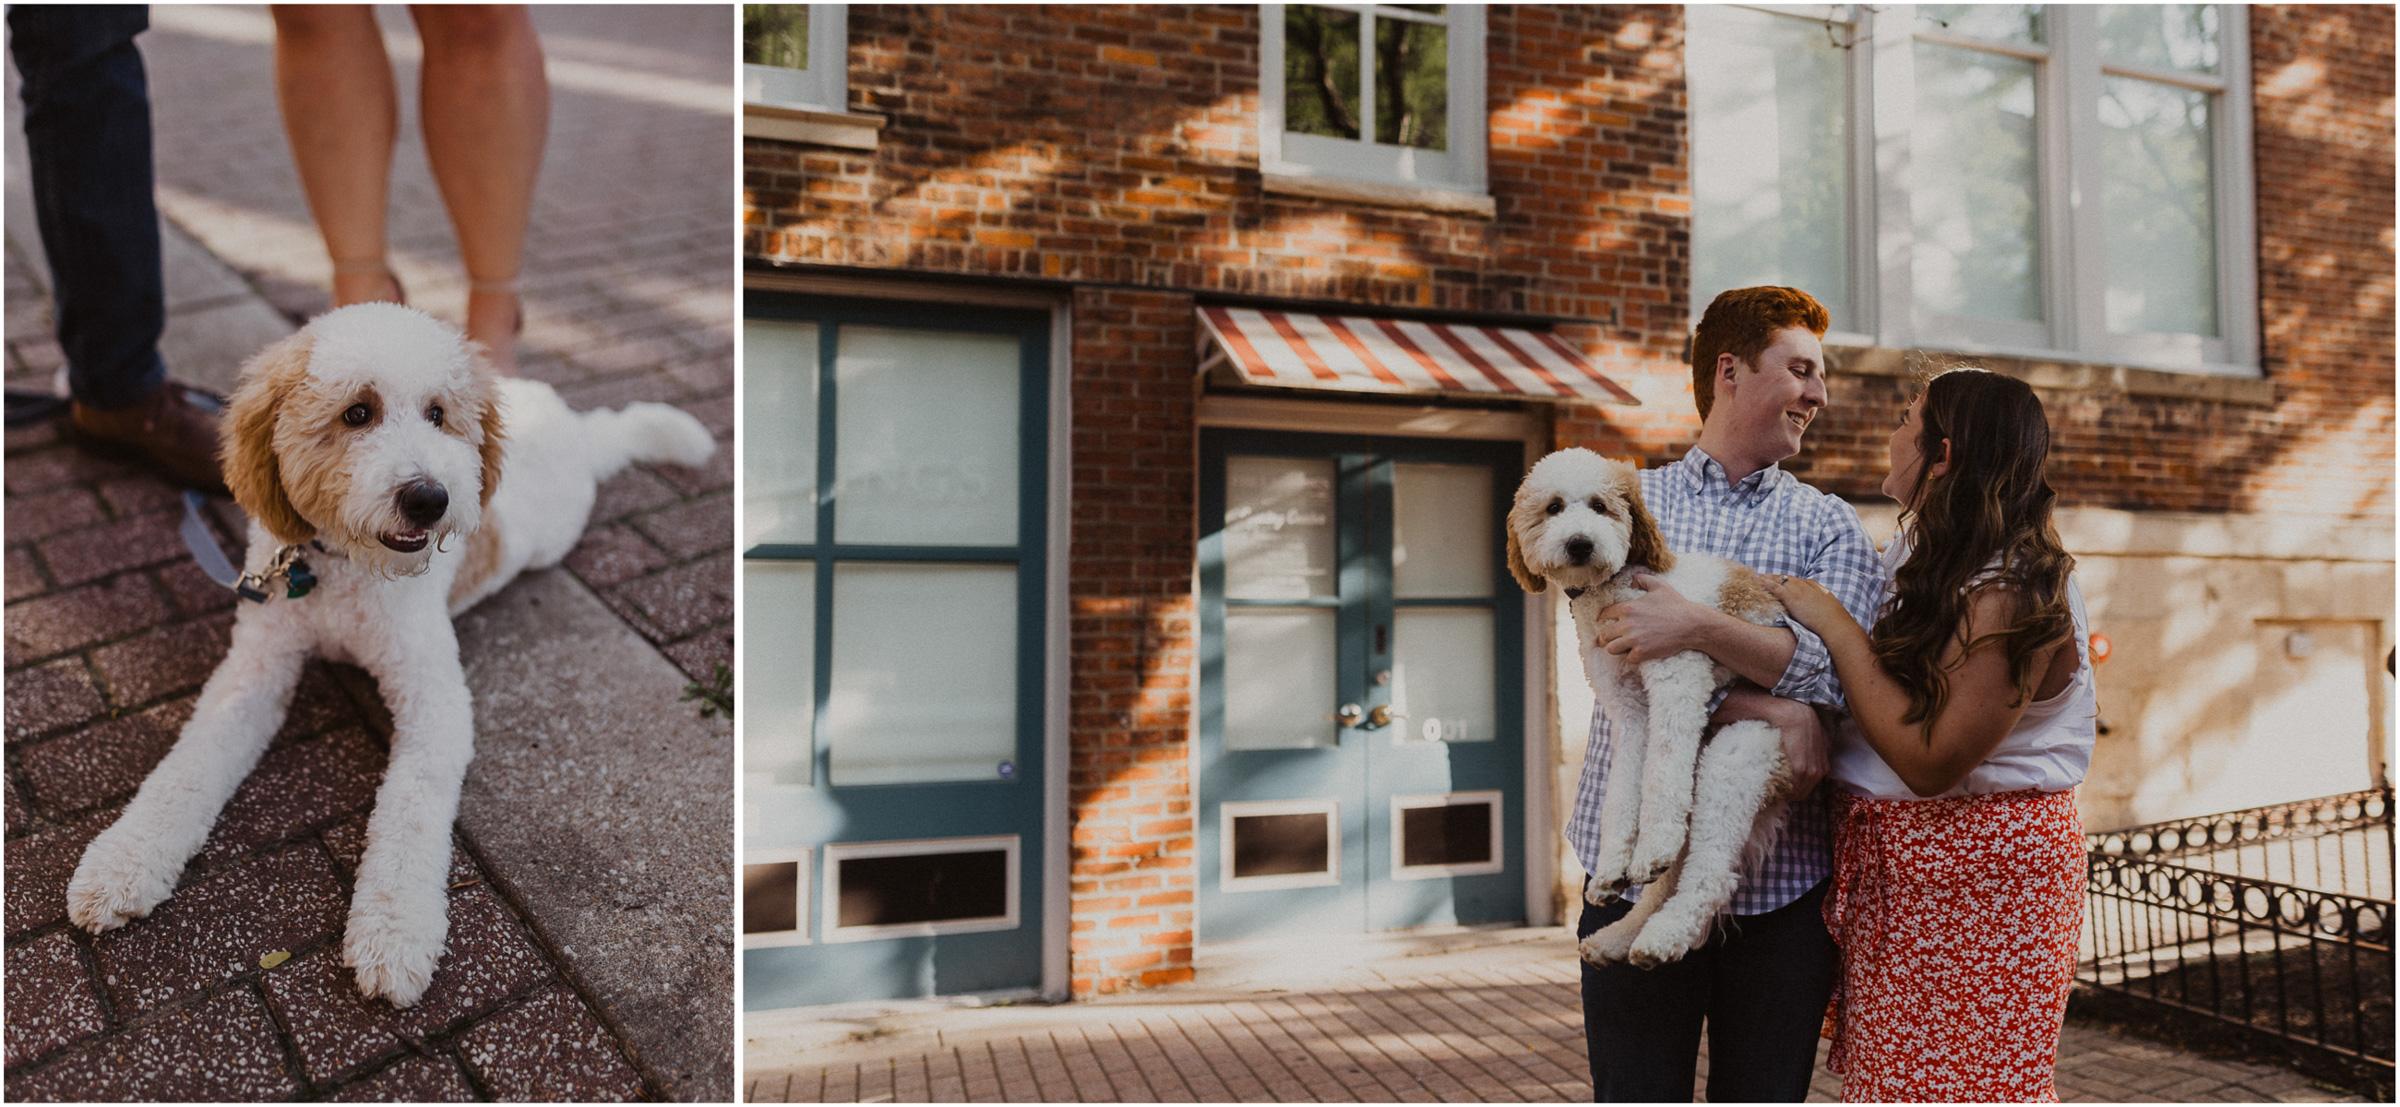 alyssa barletter photography kansas city missouri river market engagement session summer with puppy-6.jpg